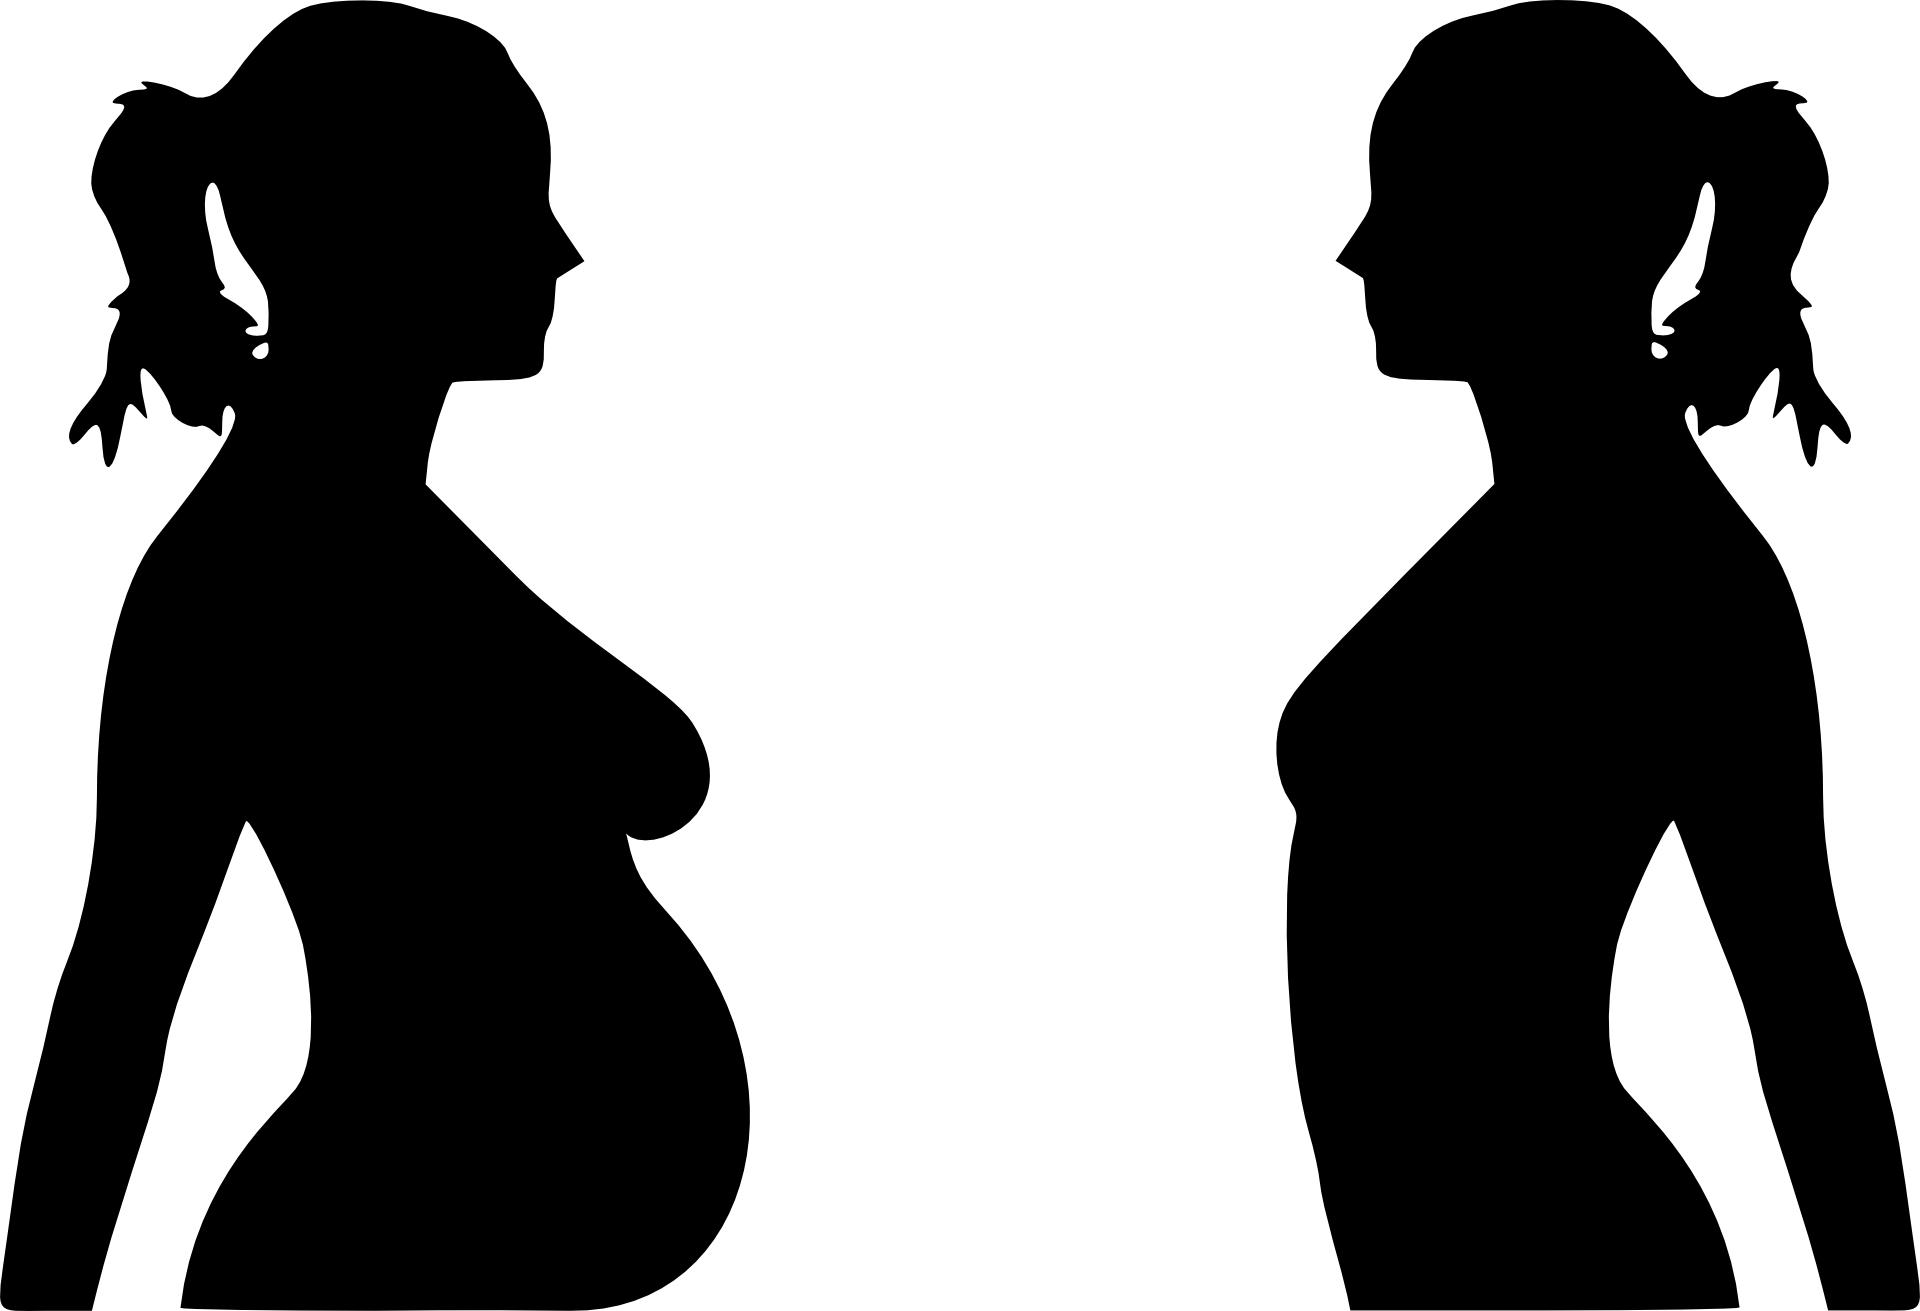 Free pregnant woman silhouette clipart jpg freeuse download Free Pregnant Woman Silhouette Free Clip Art, Download Free Clip Art ... jpg freeuse download